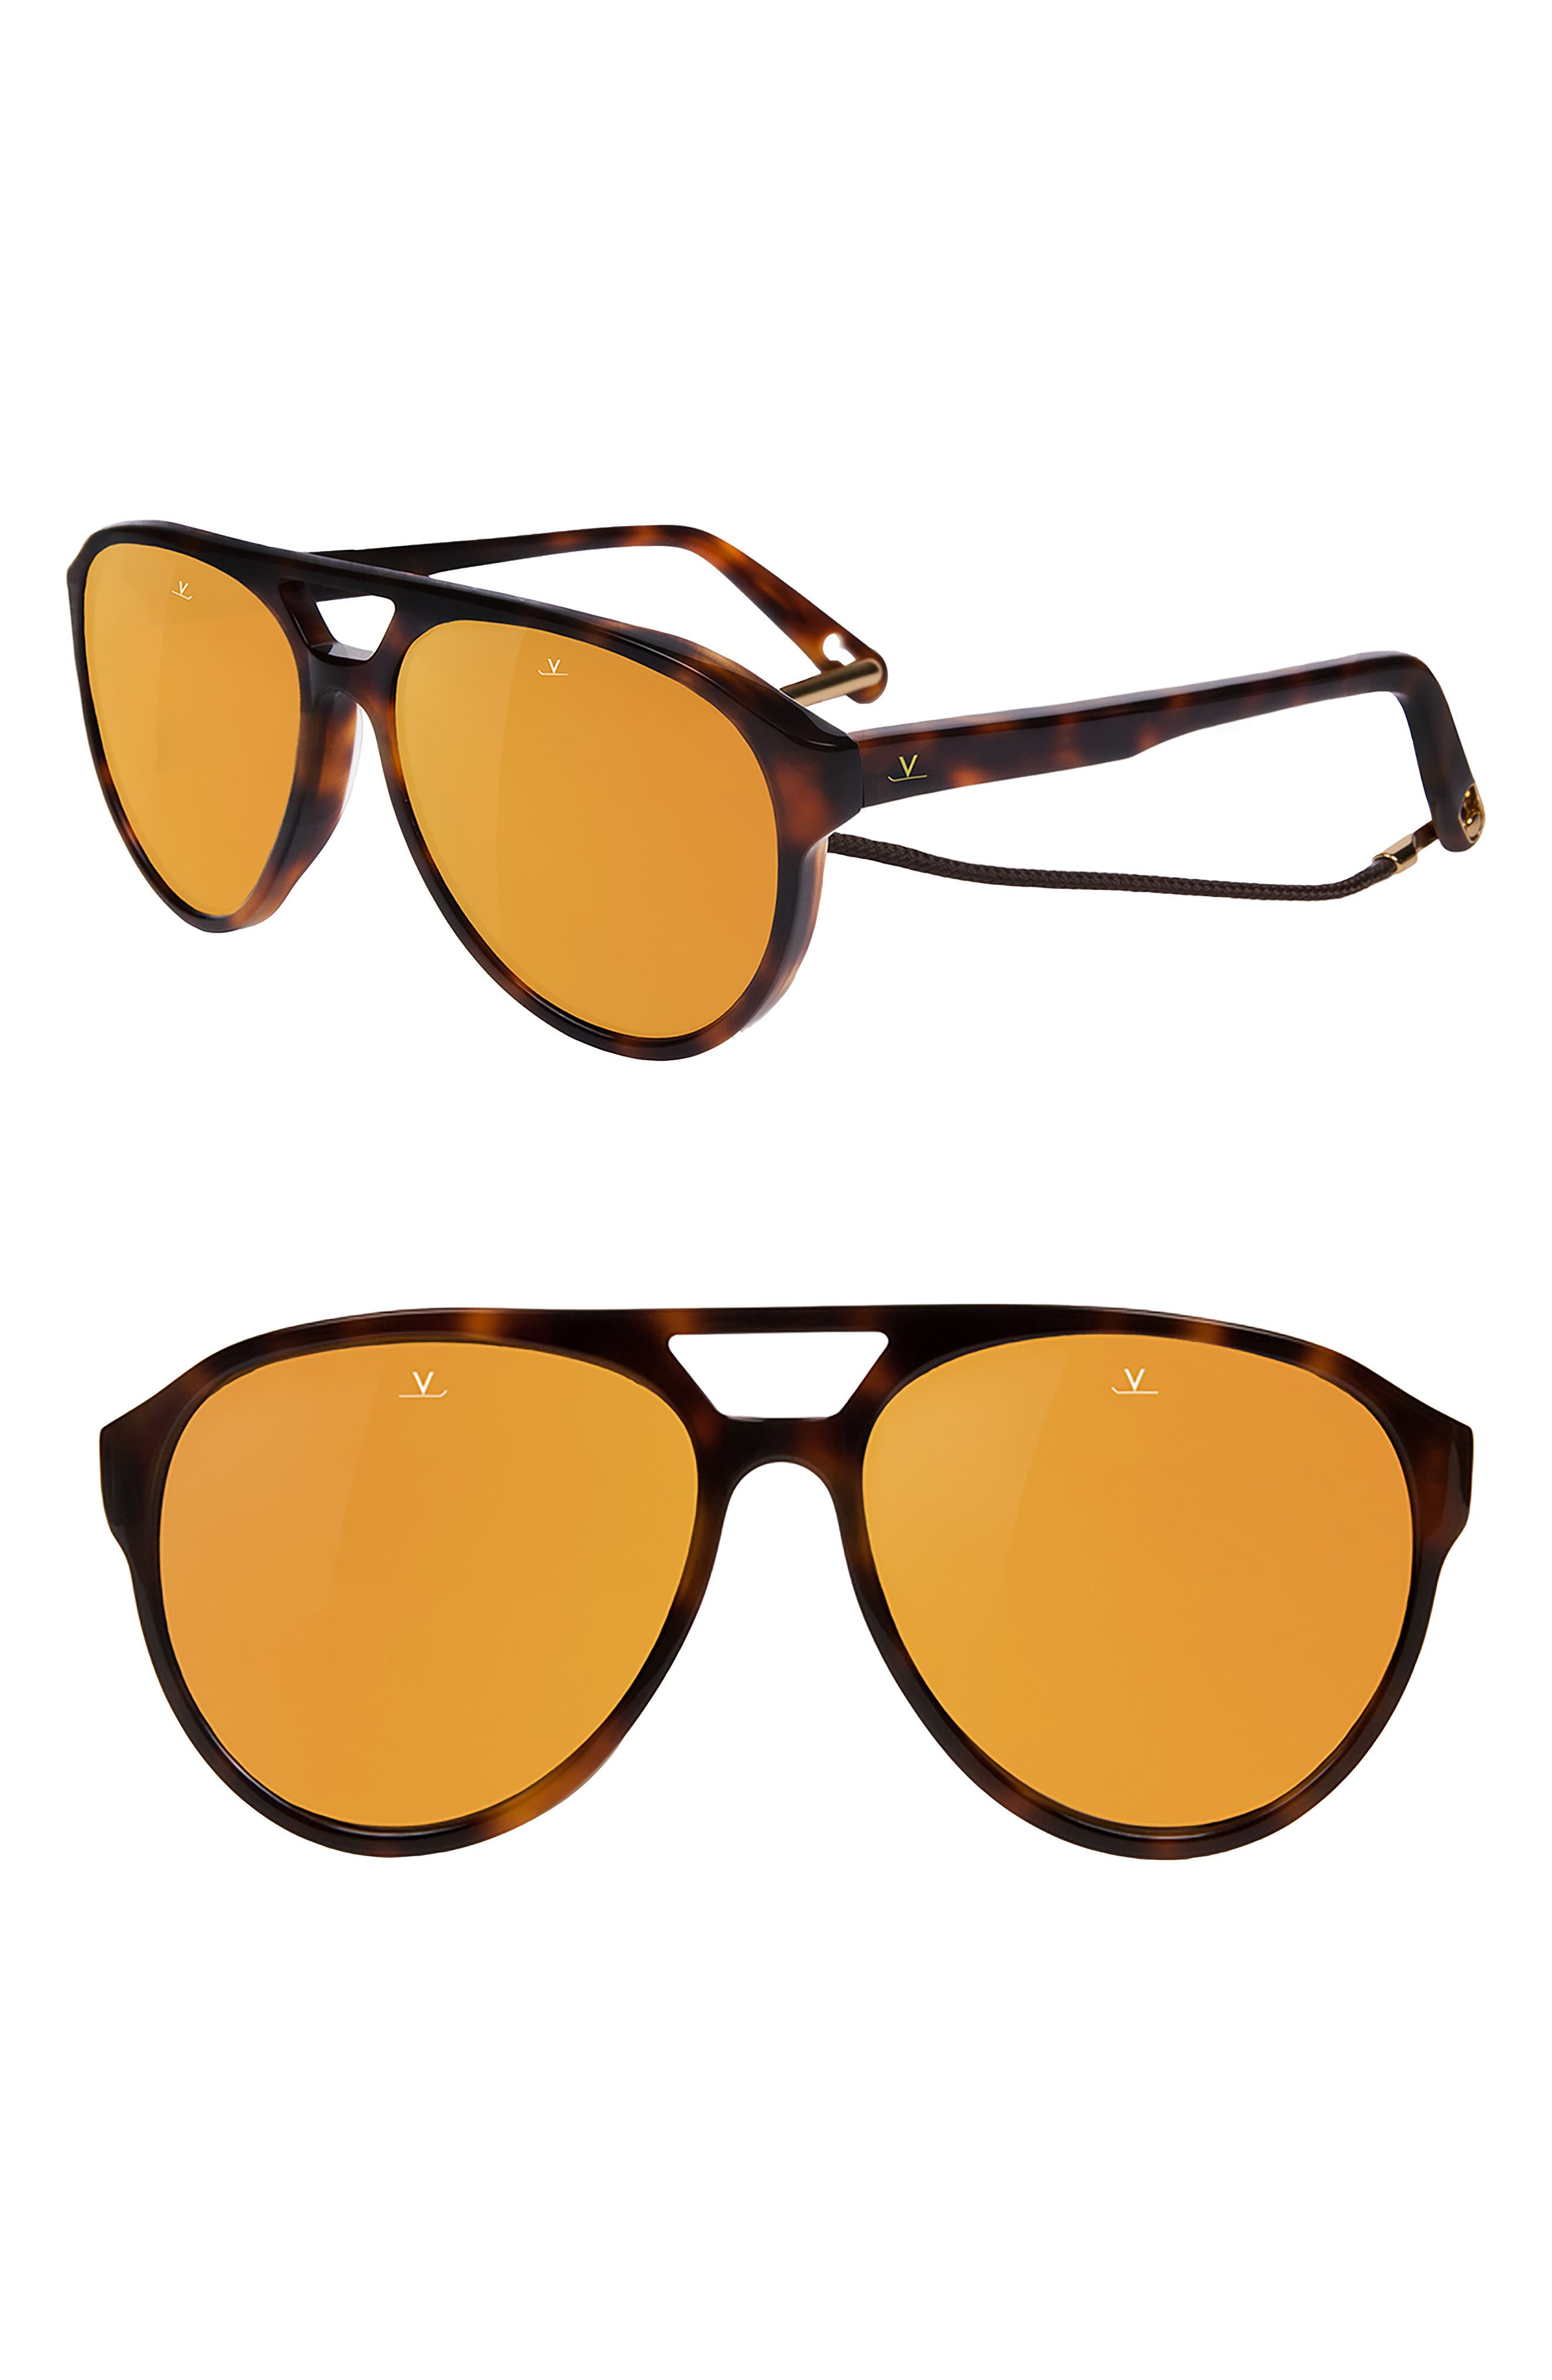 Tom 64mm Aviator Sunglasses,                             Main thumbnail 1, color,                             202